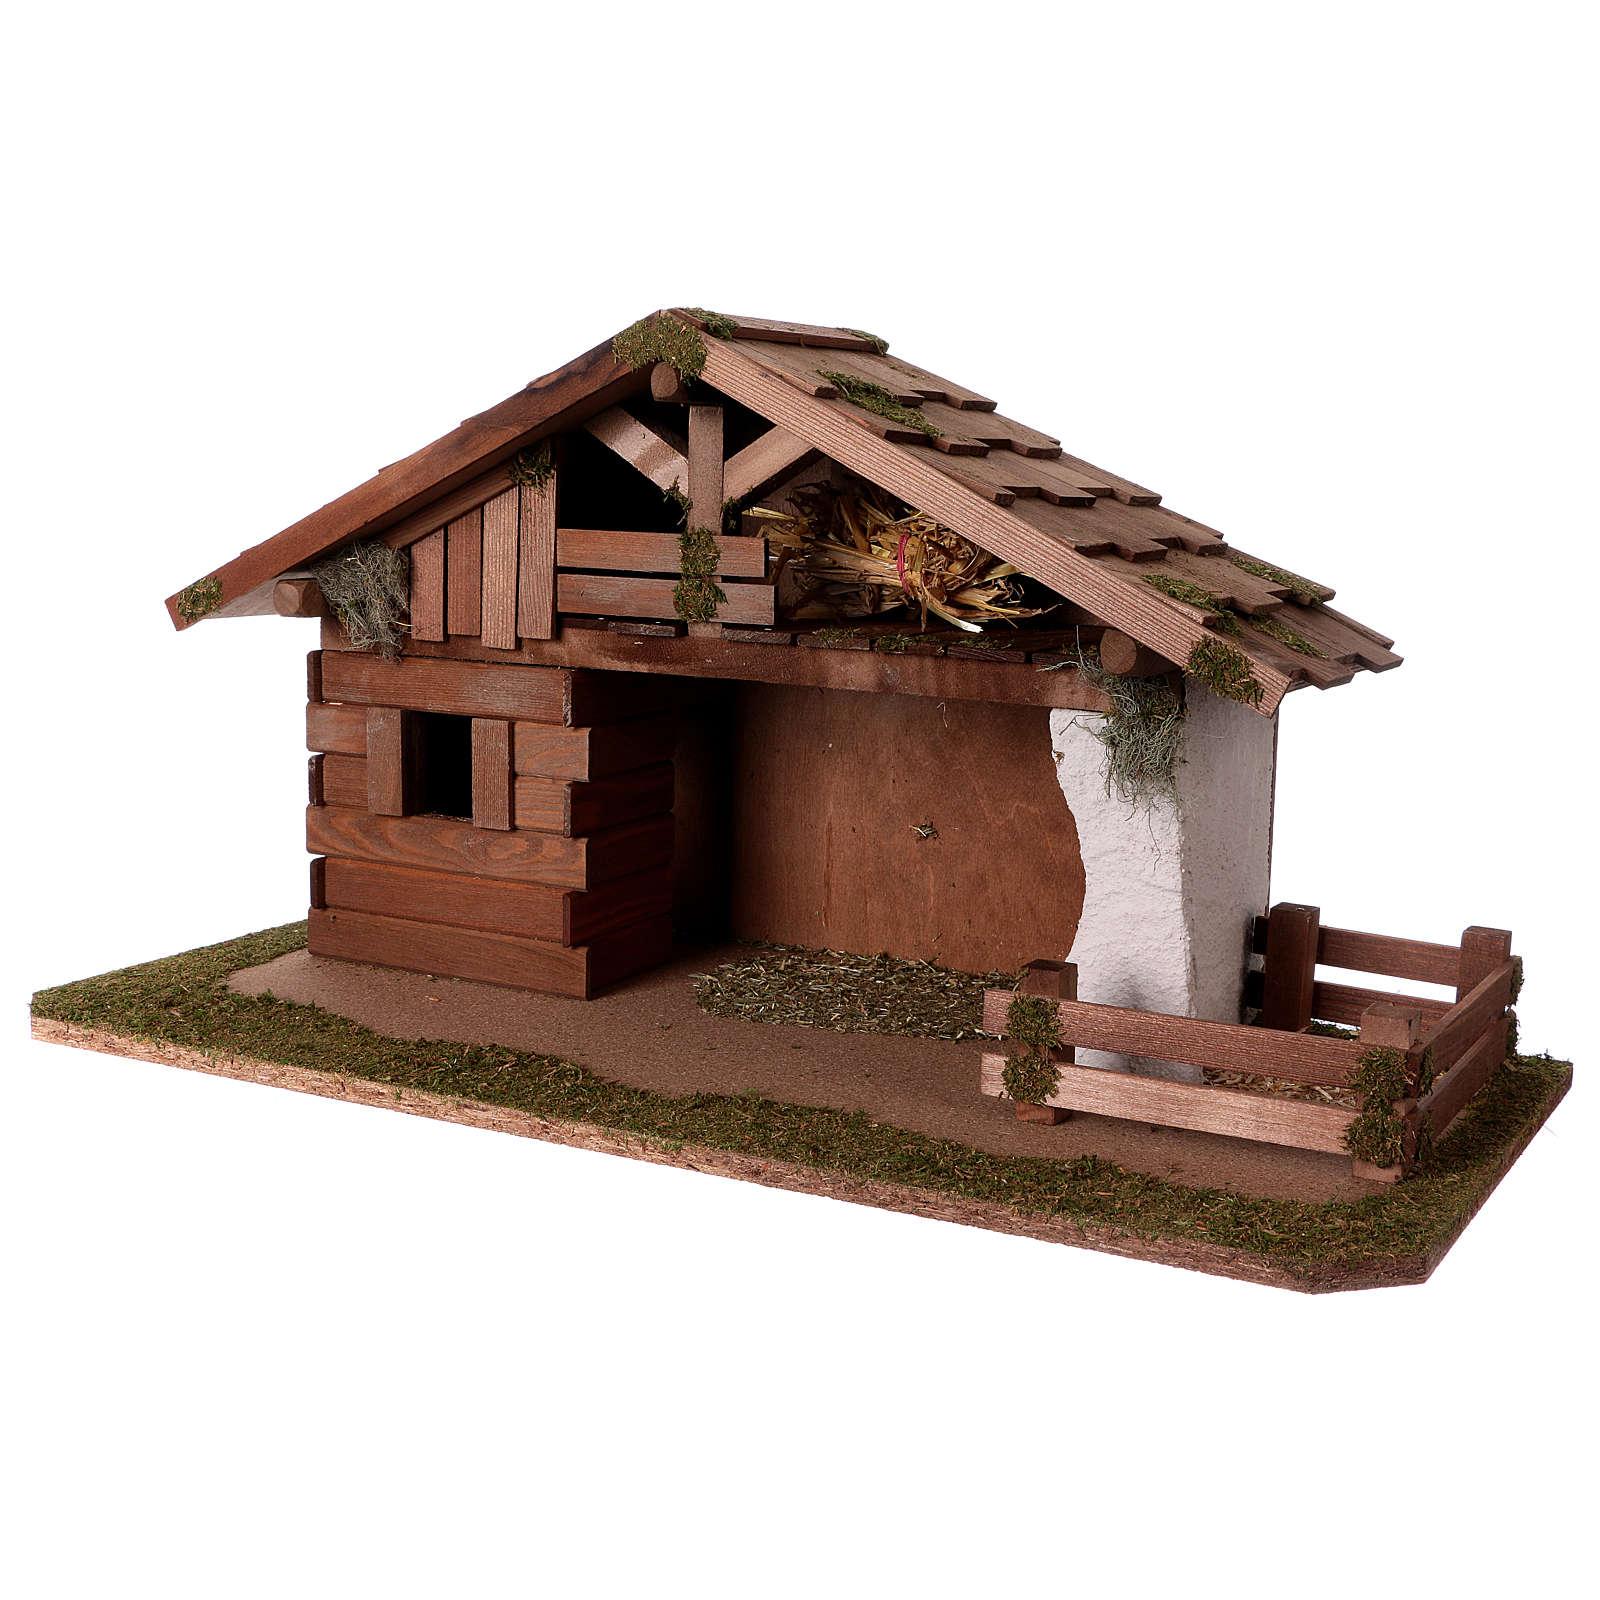 Capanna con stanza e recinto 33x62x30 cm presepe 13 cm 4